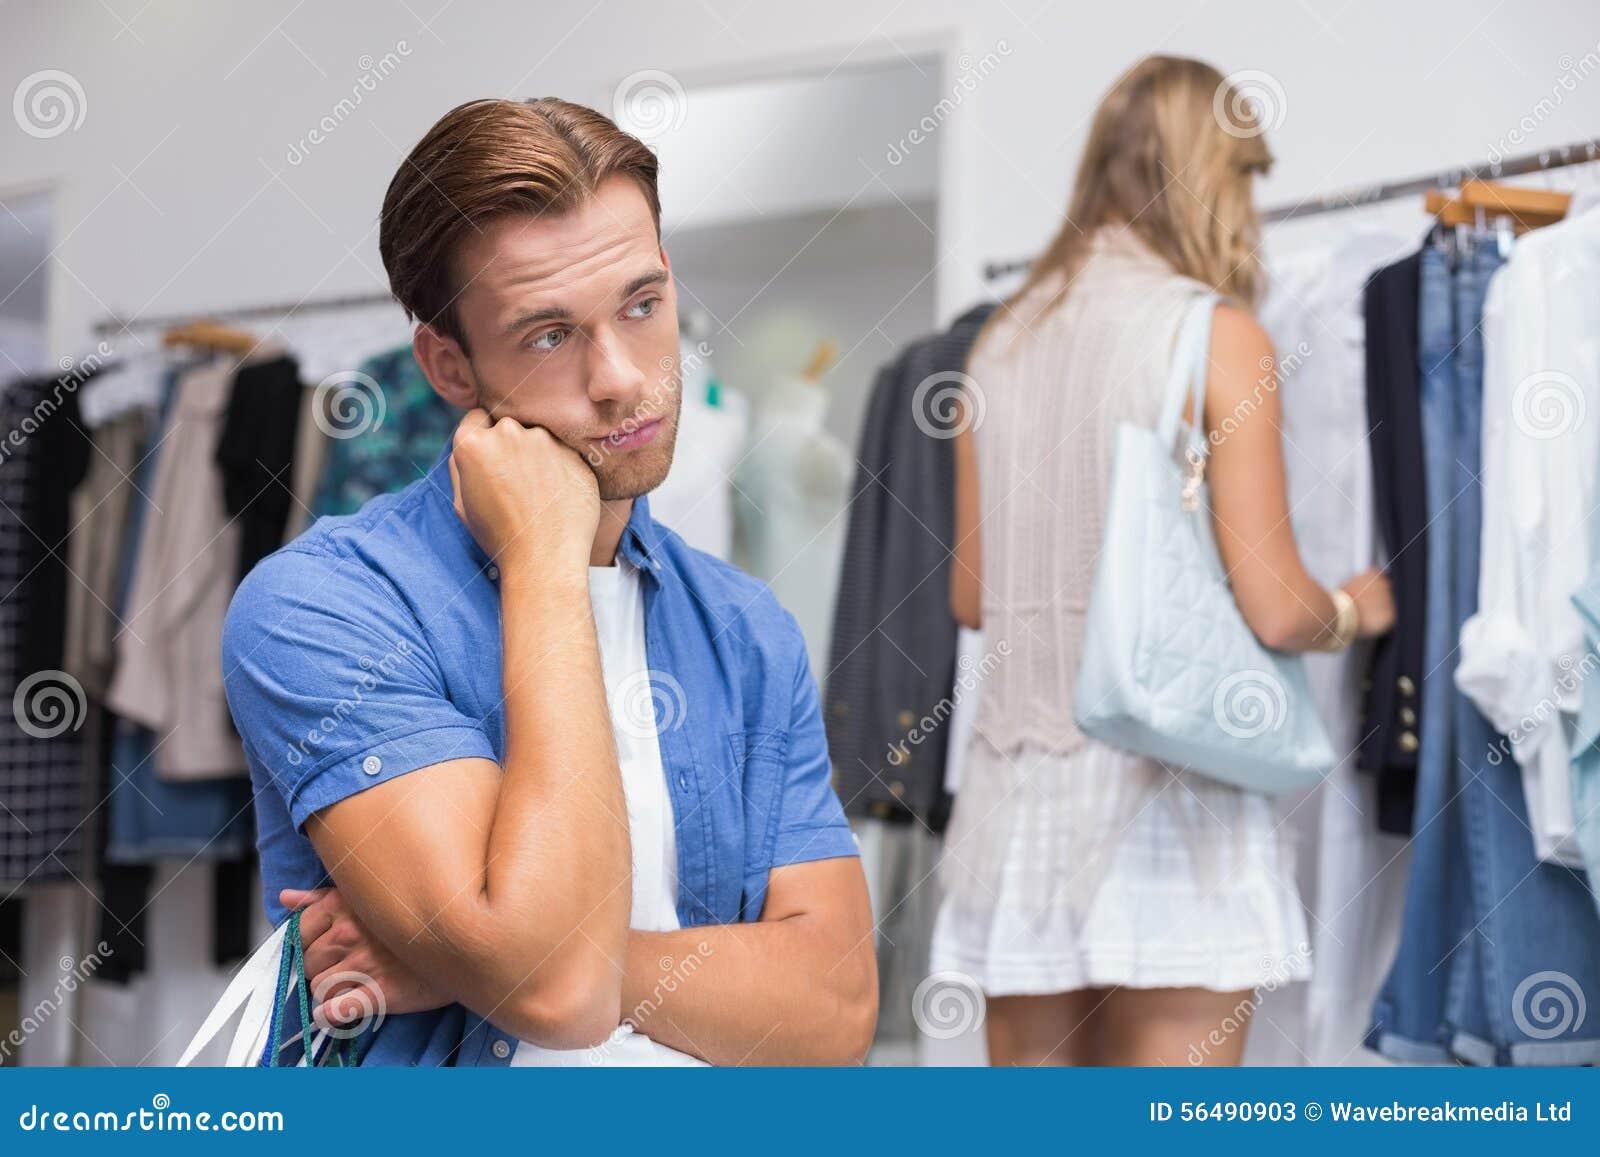 Un homme ennuyé avec sa main sous son menton